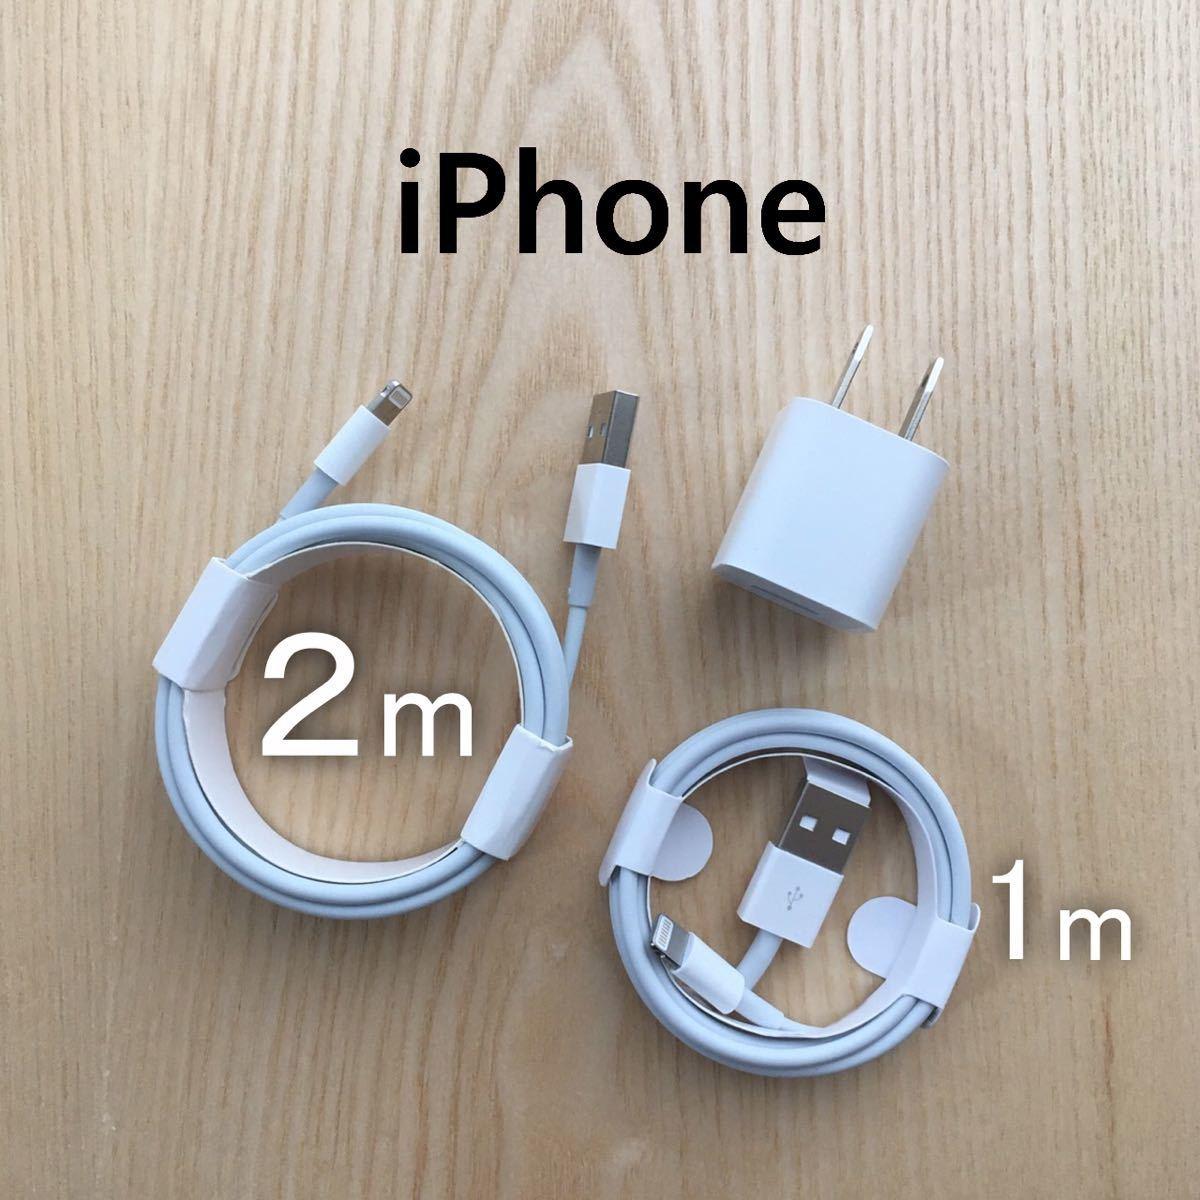 iPhone 充電器 充電ケーブル コード lightning cable ライトニングケーブル(高速充電 急速充電)データ転送